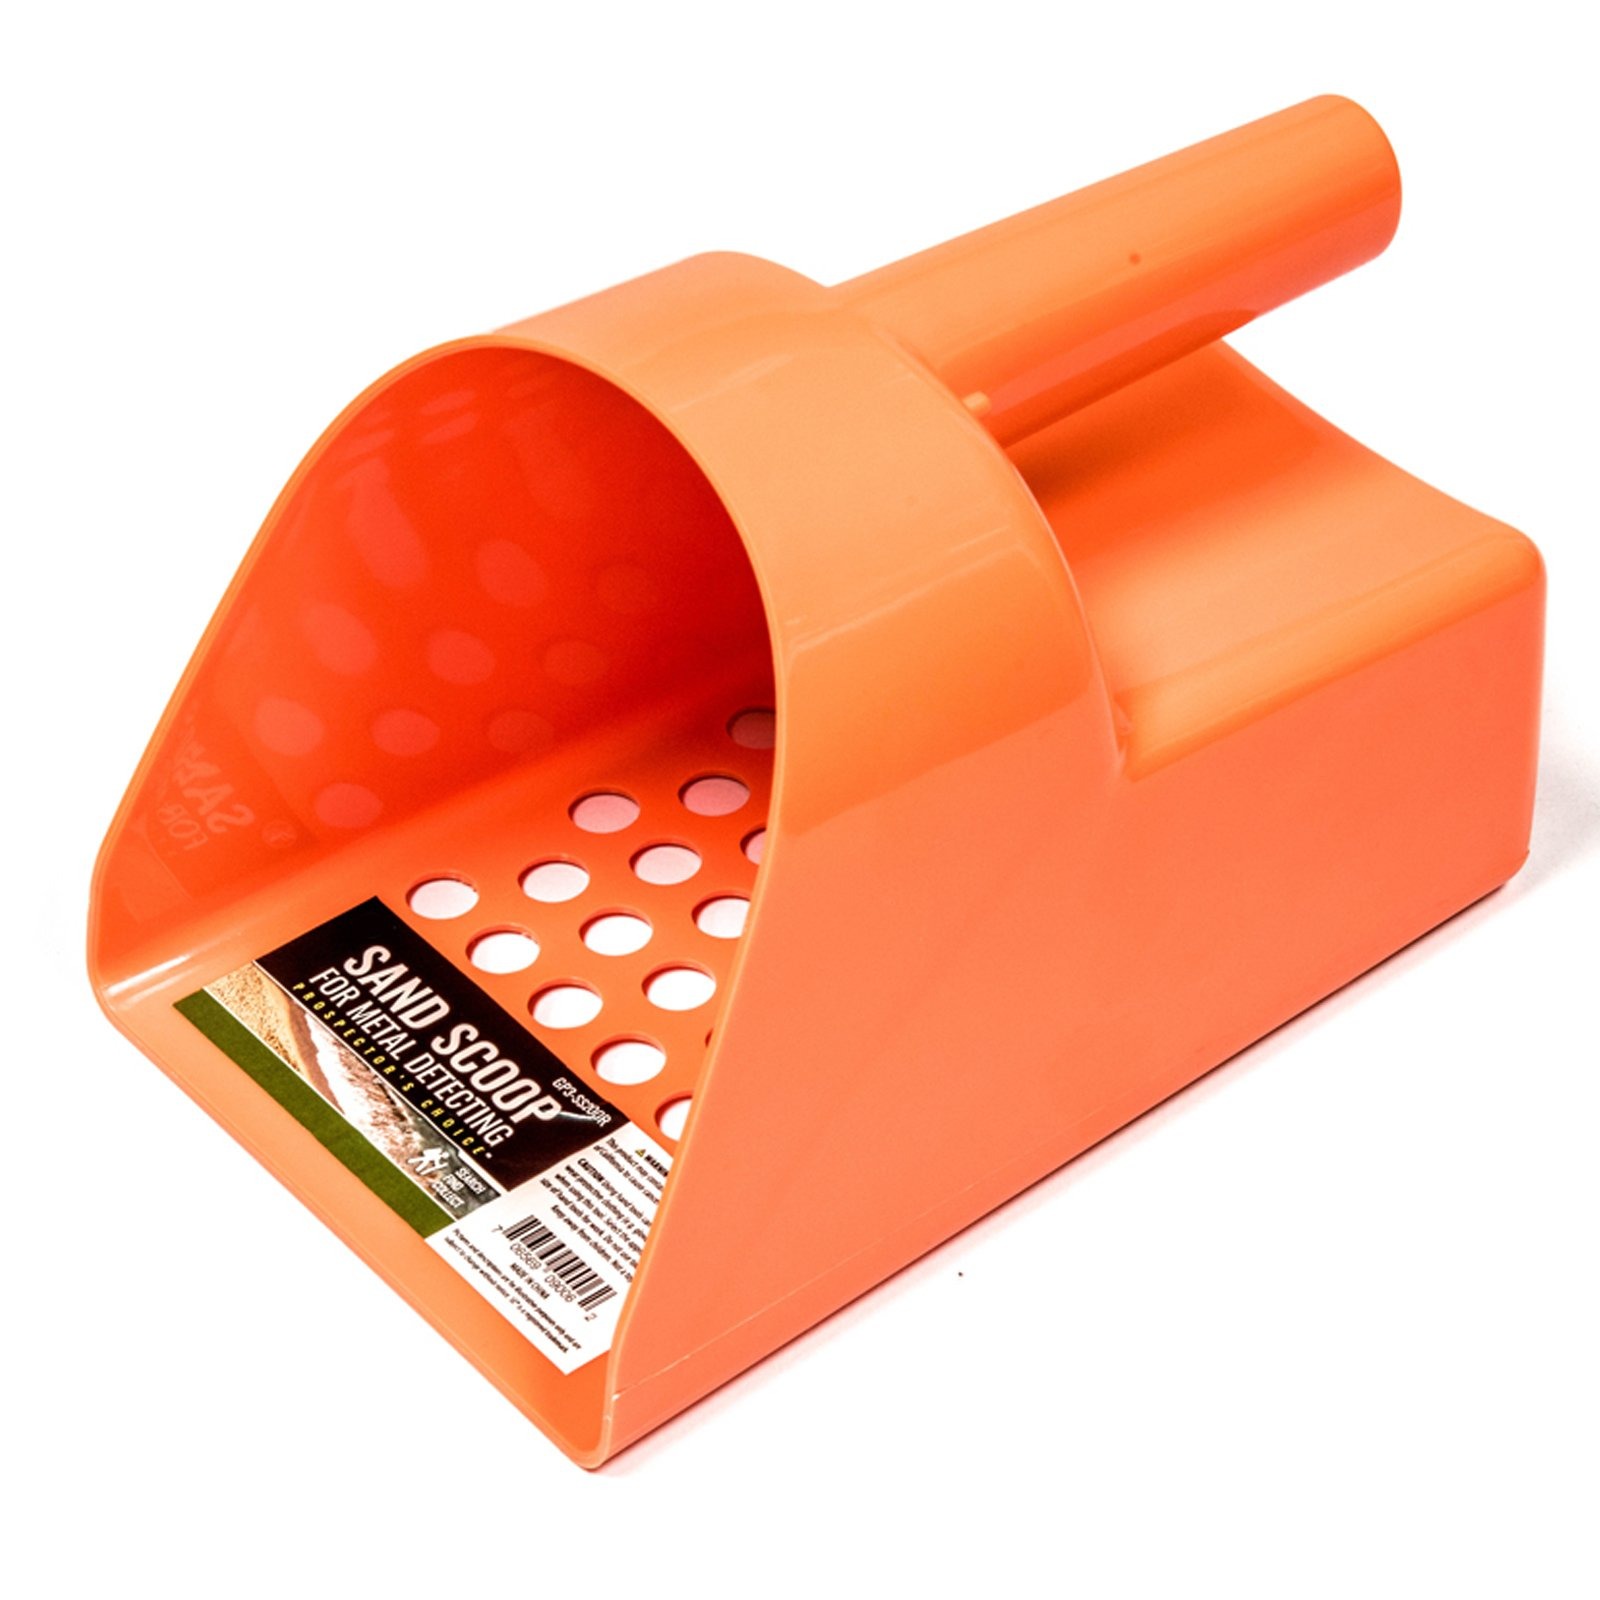 ASR Outdoor 8.5 Inch Orange Plastic Sand Scoop for Gold Panning